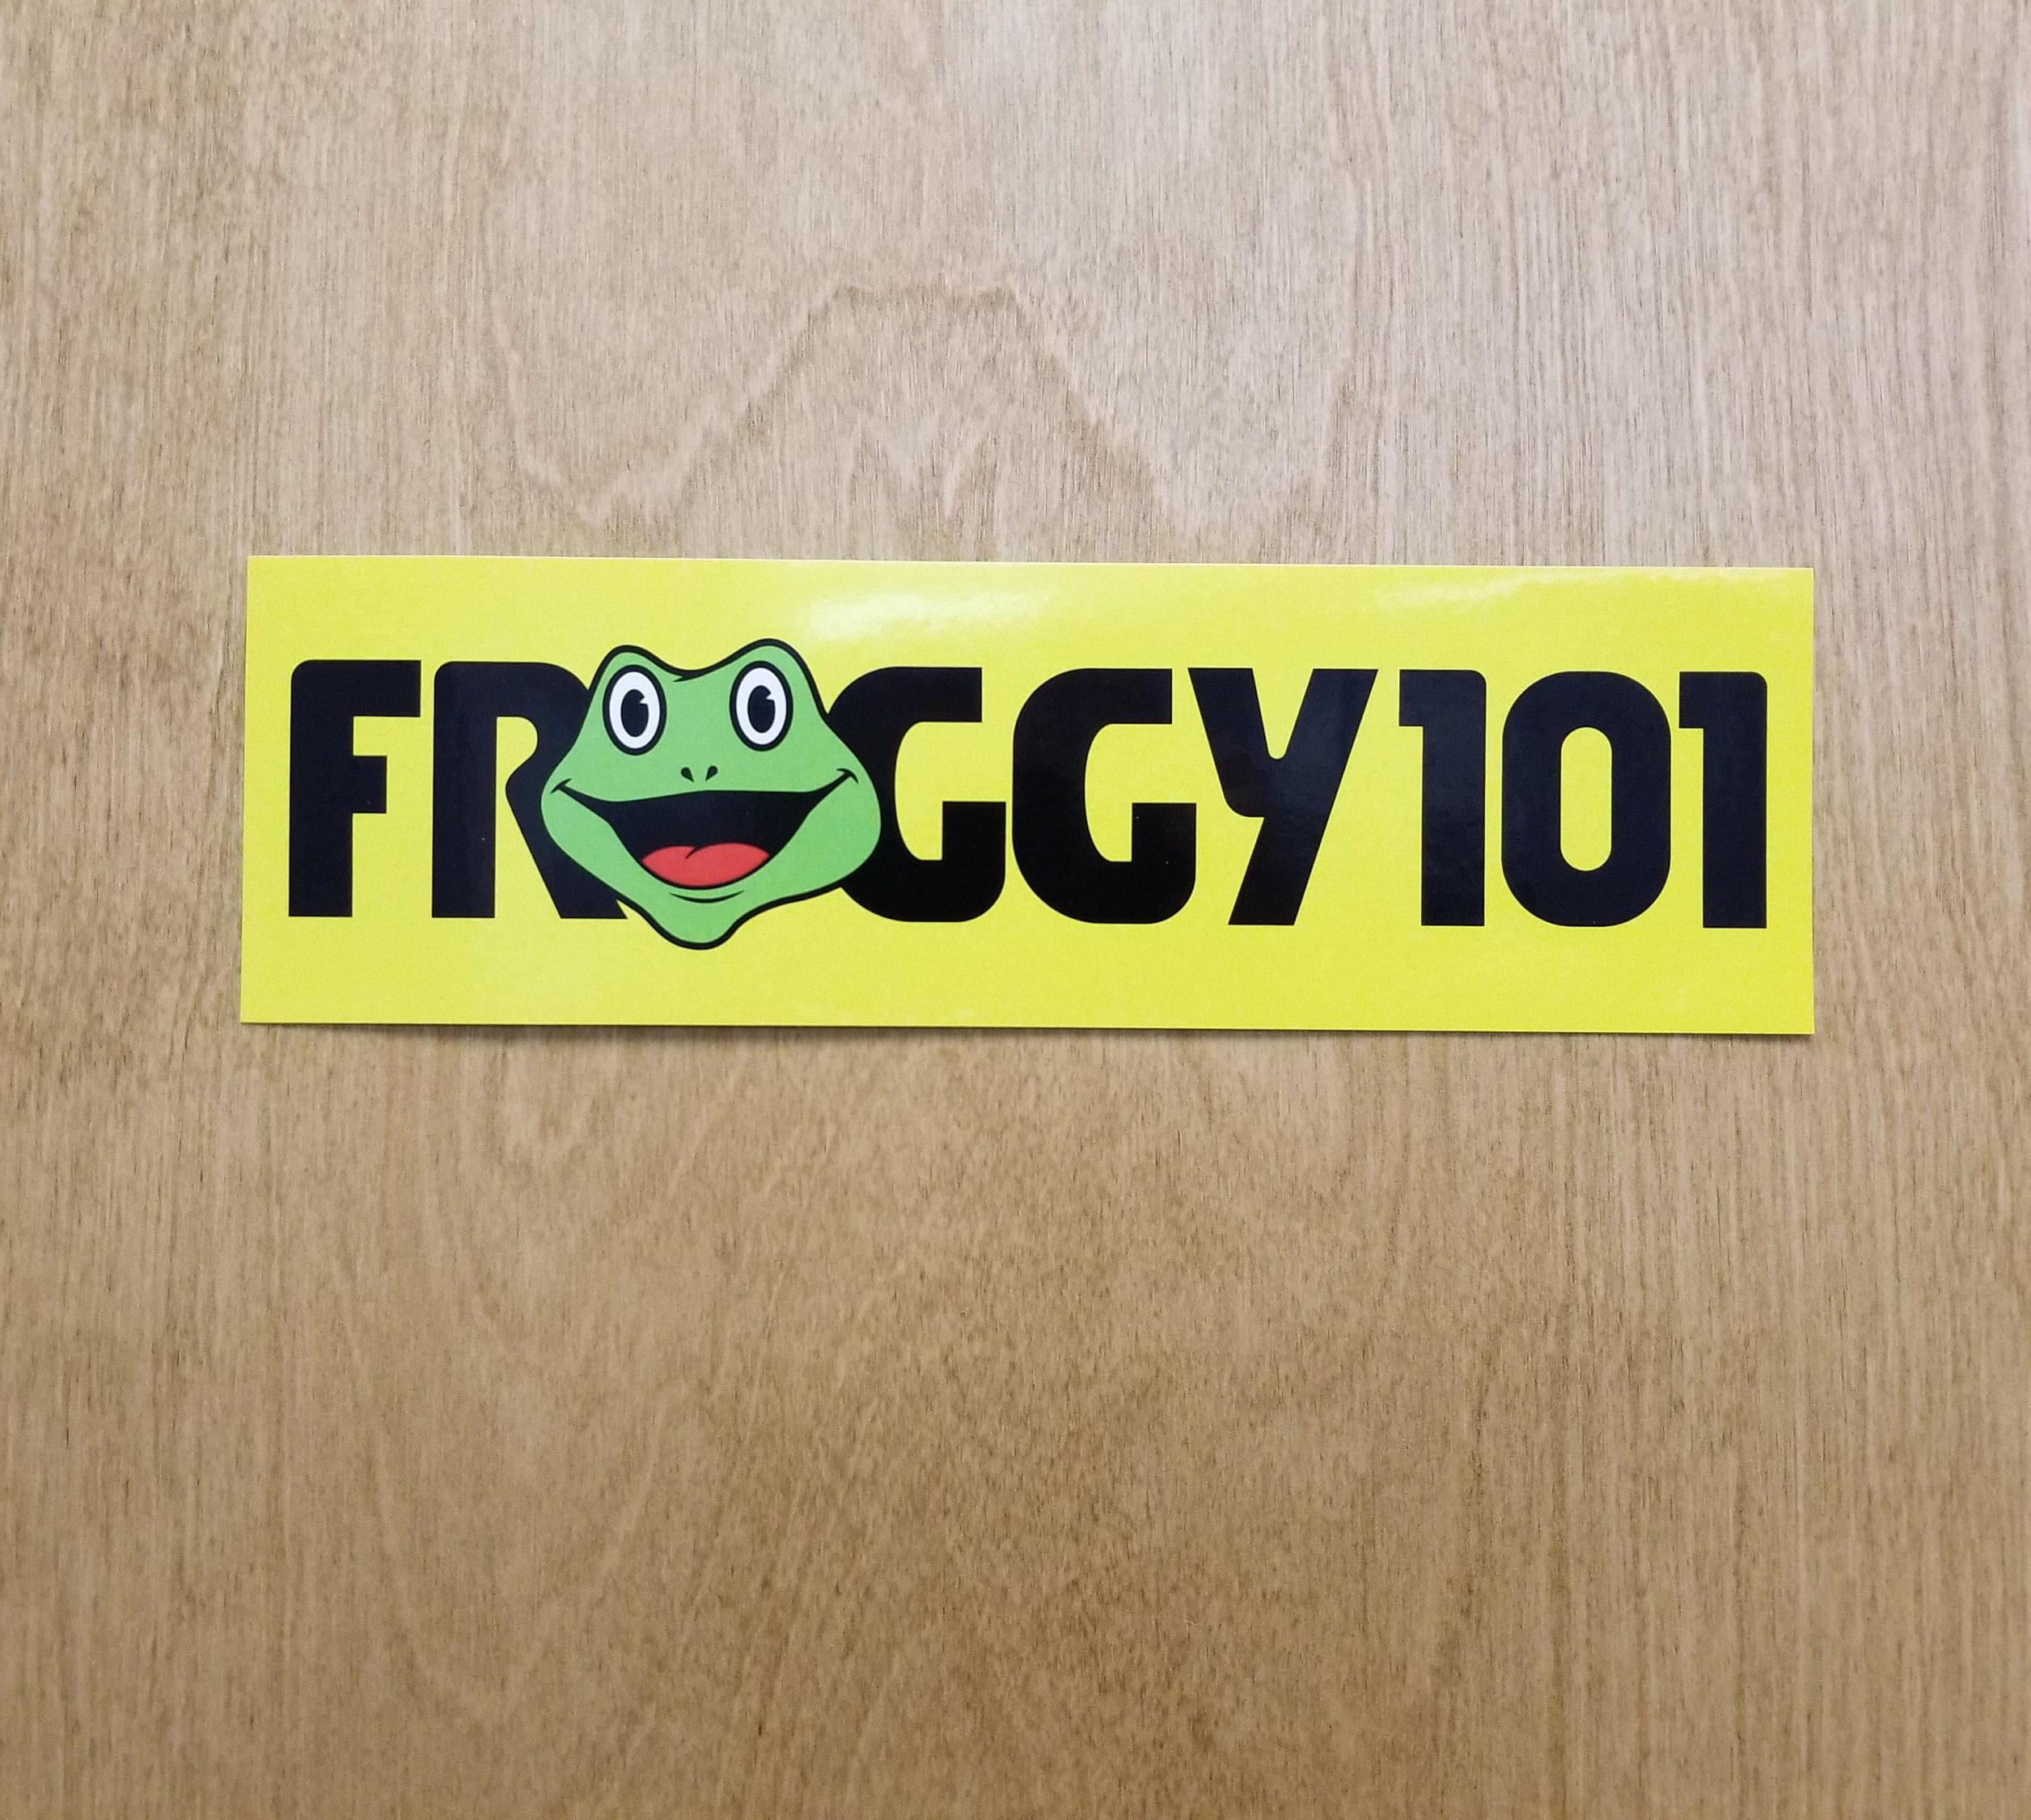 Froggy 101 bumper sticker desk sticker 🔎agrandir